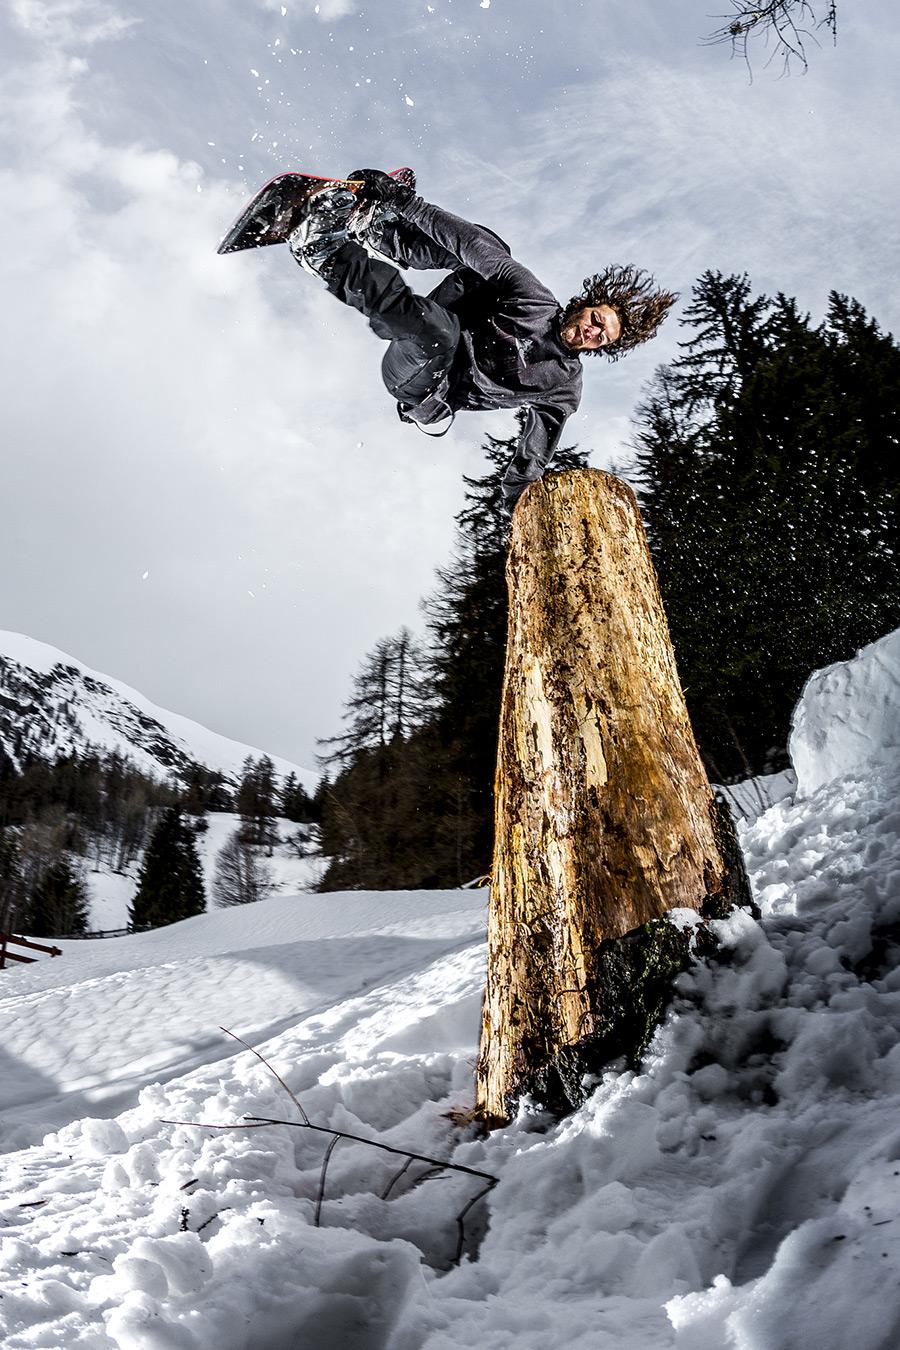 Foto: Roberto Bragotto | Fahrer: Simon Grigis | © COTM